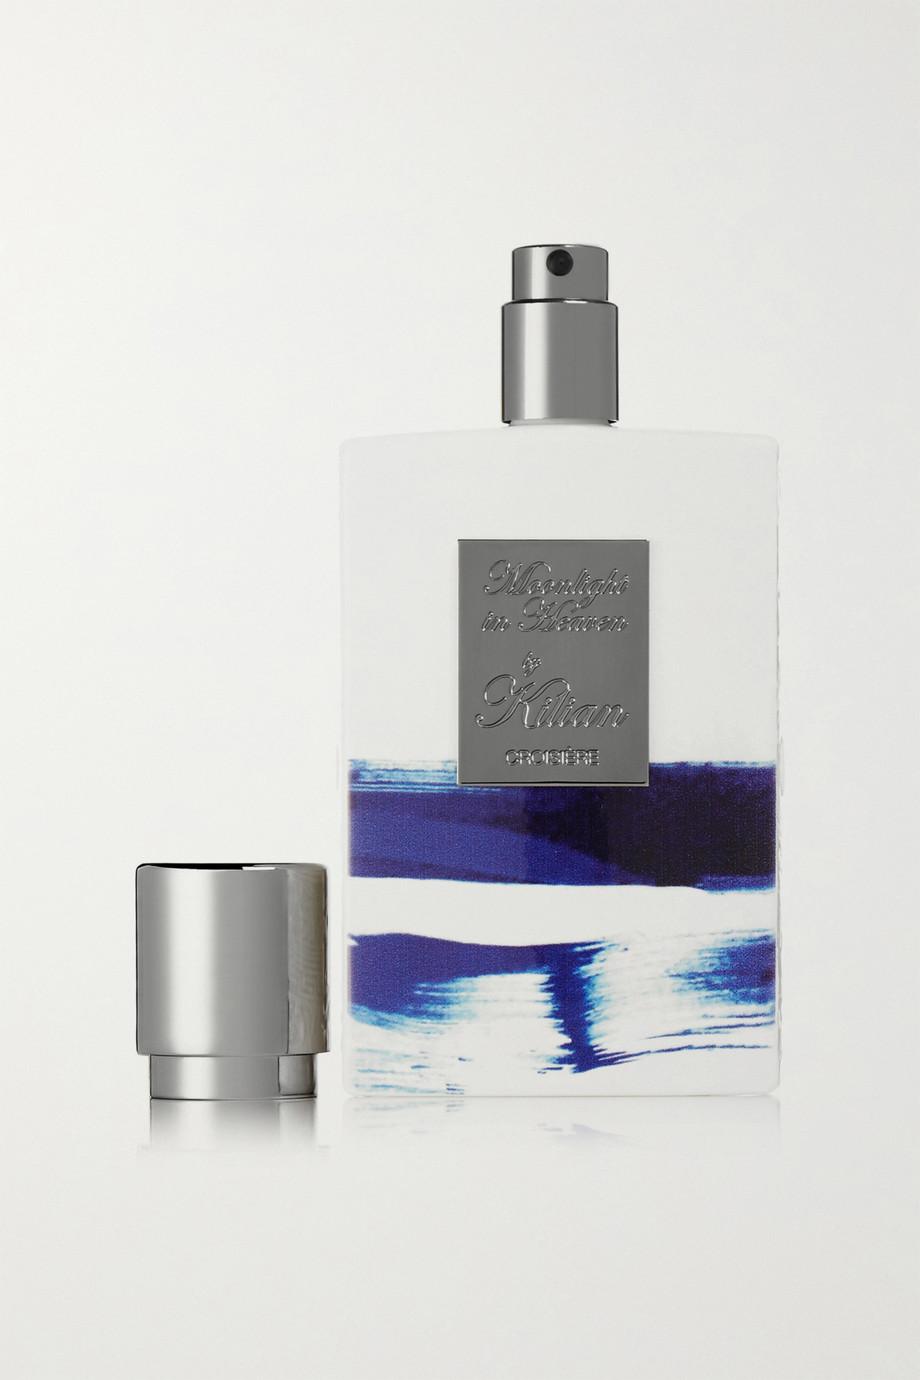 Kilian Moonlight in Heaven – Croisière, 50 ml – Eau de Parfum